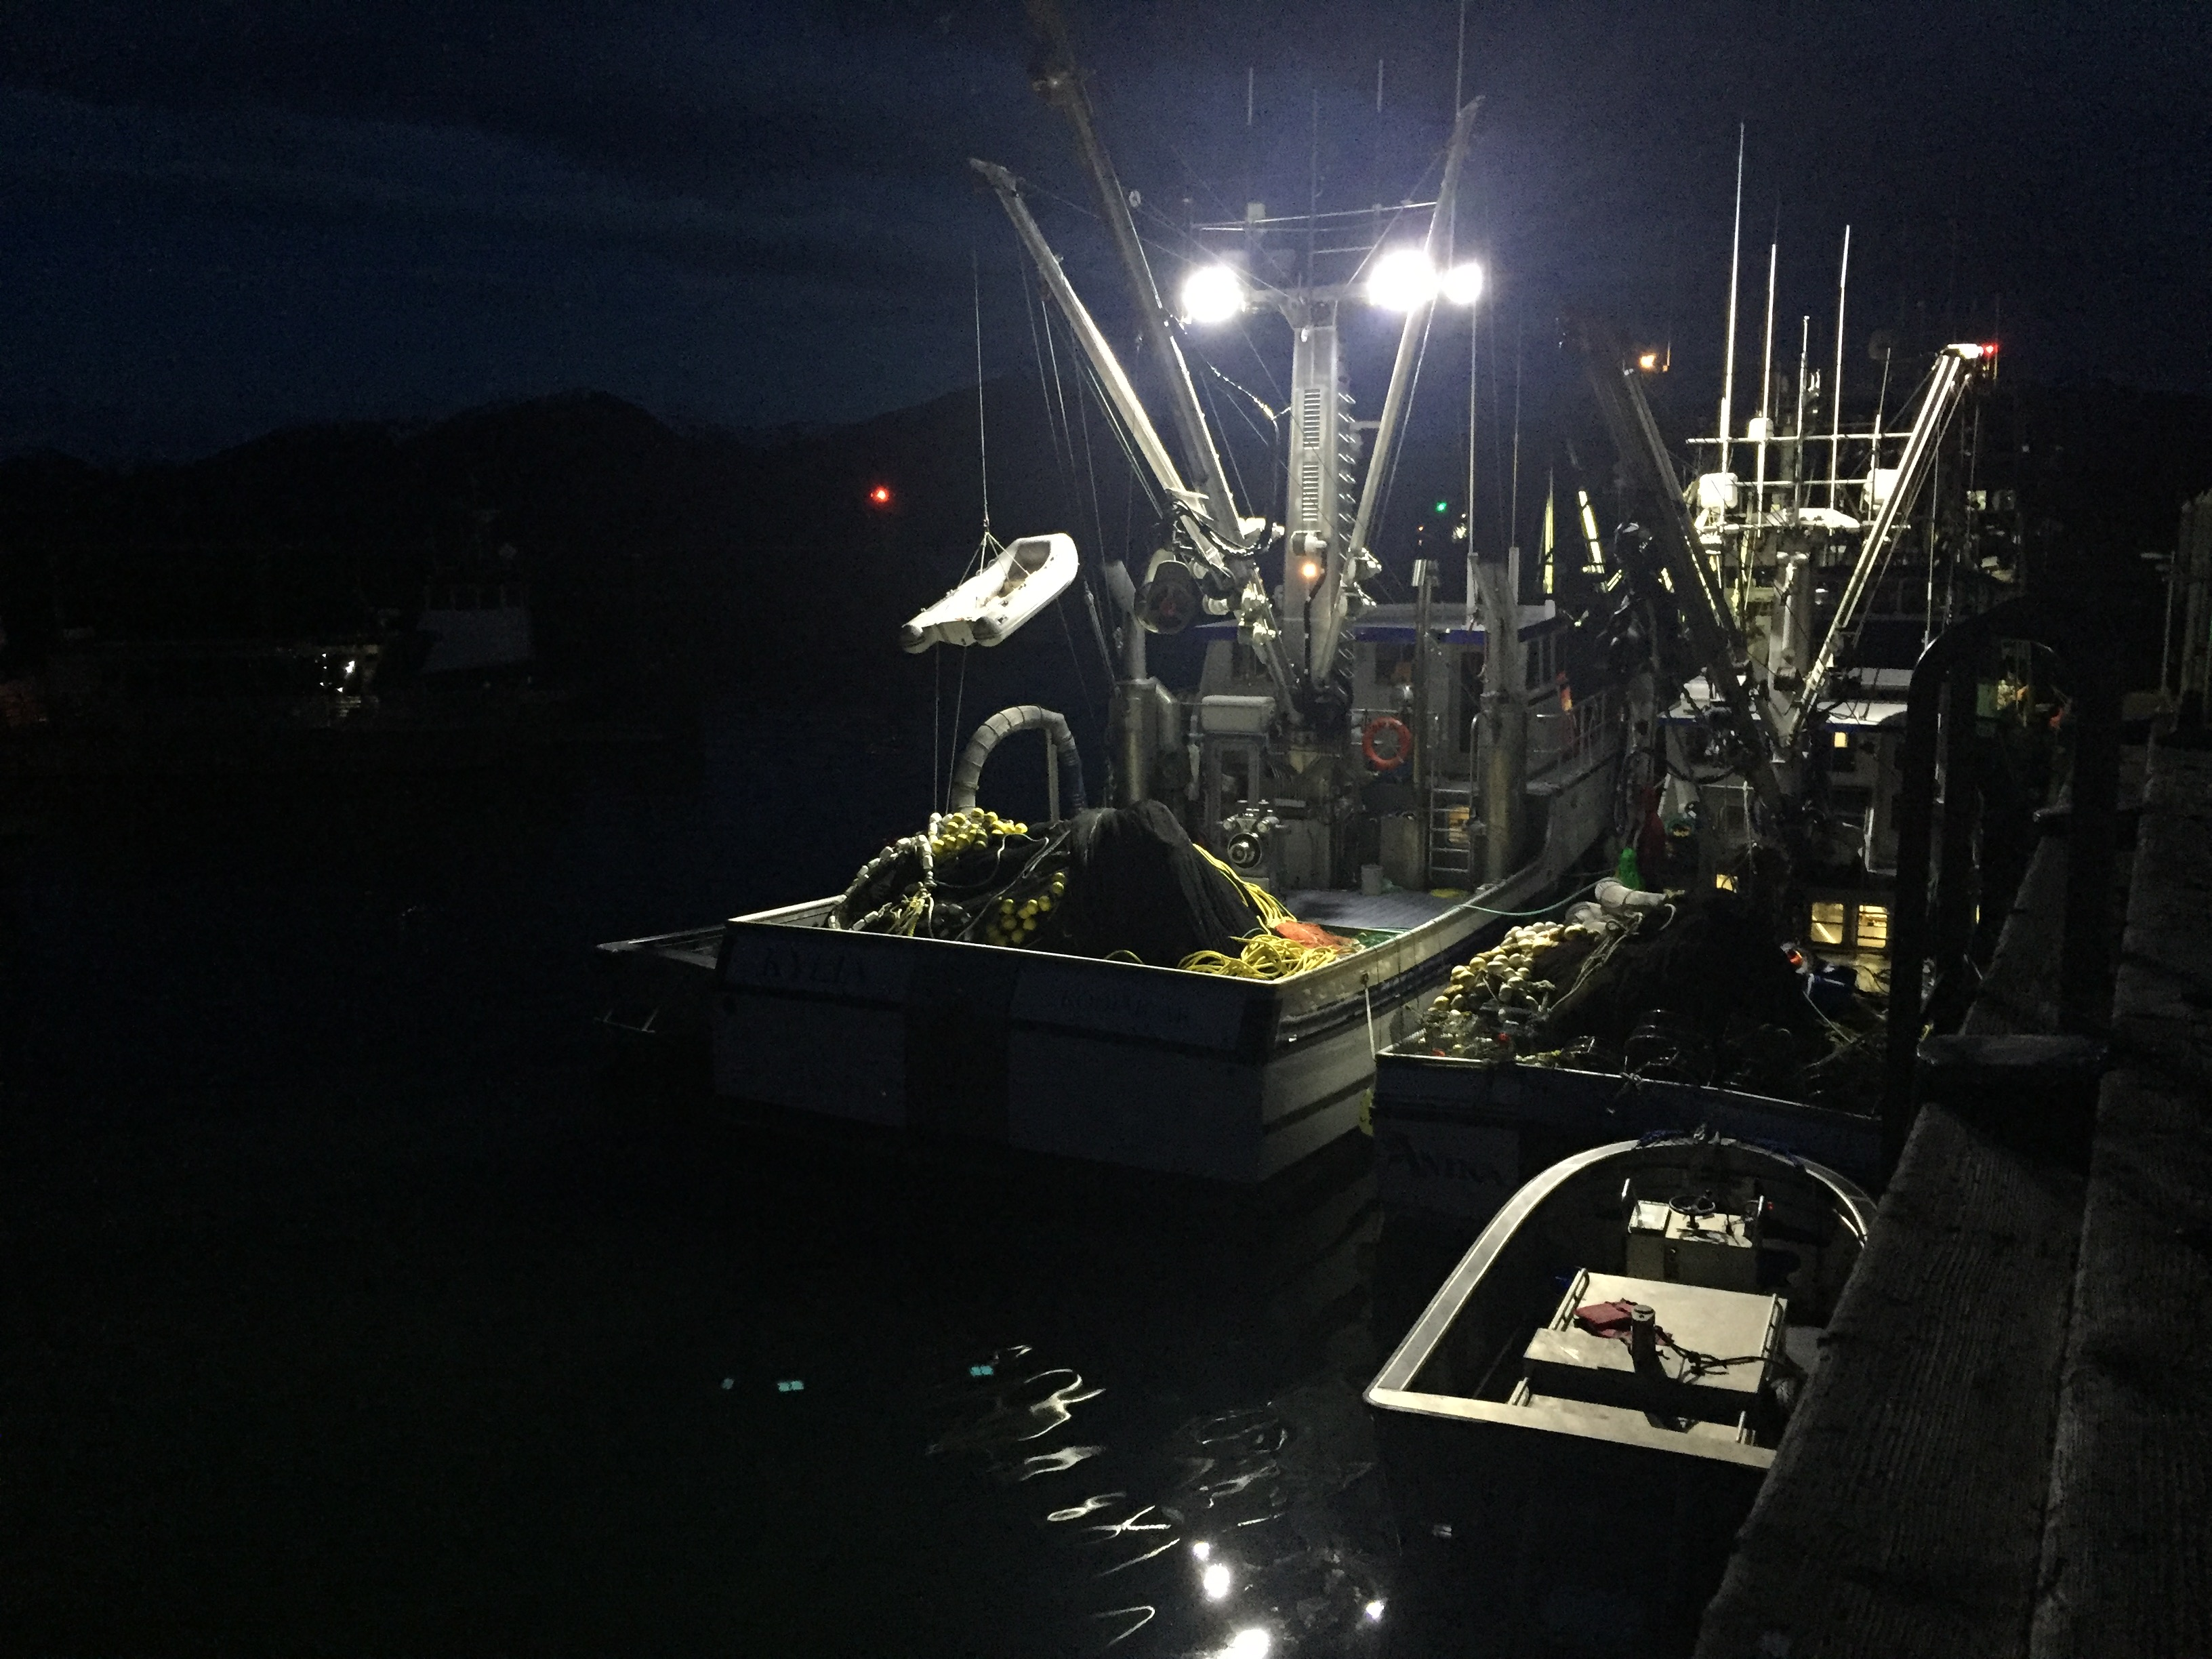 Herring fleet fishes Krestof; half of quota taken